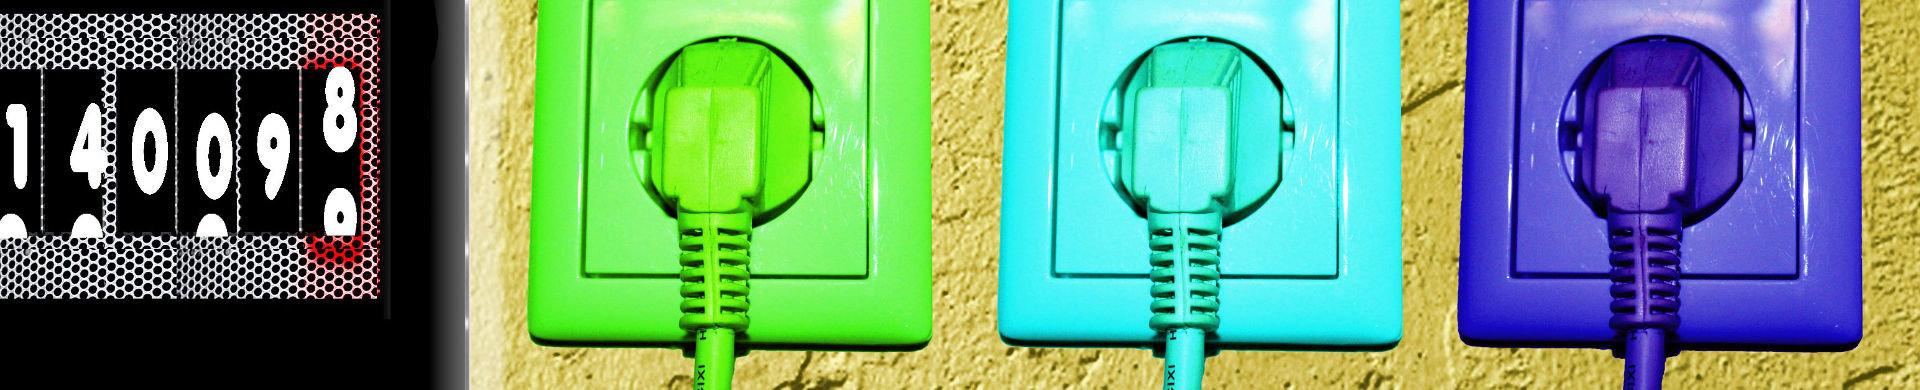 header-stopcontact-meterkast-cc0-kalhh-via-pixabay